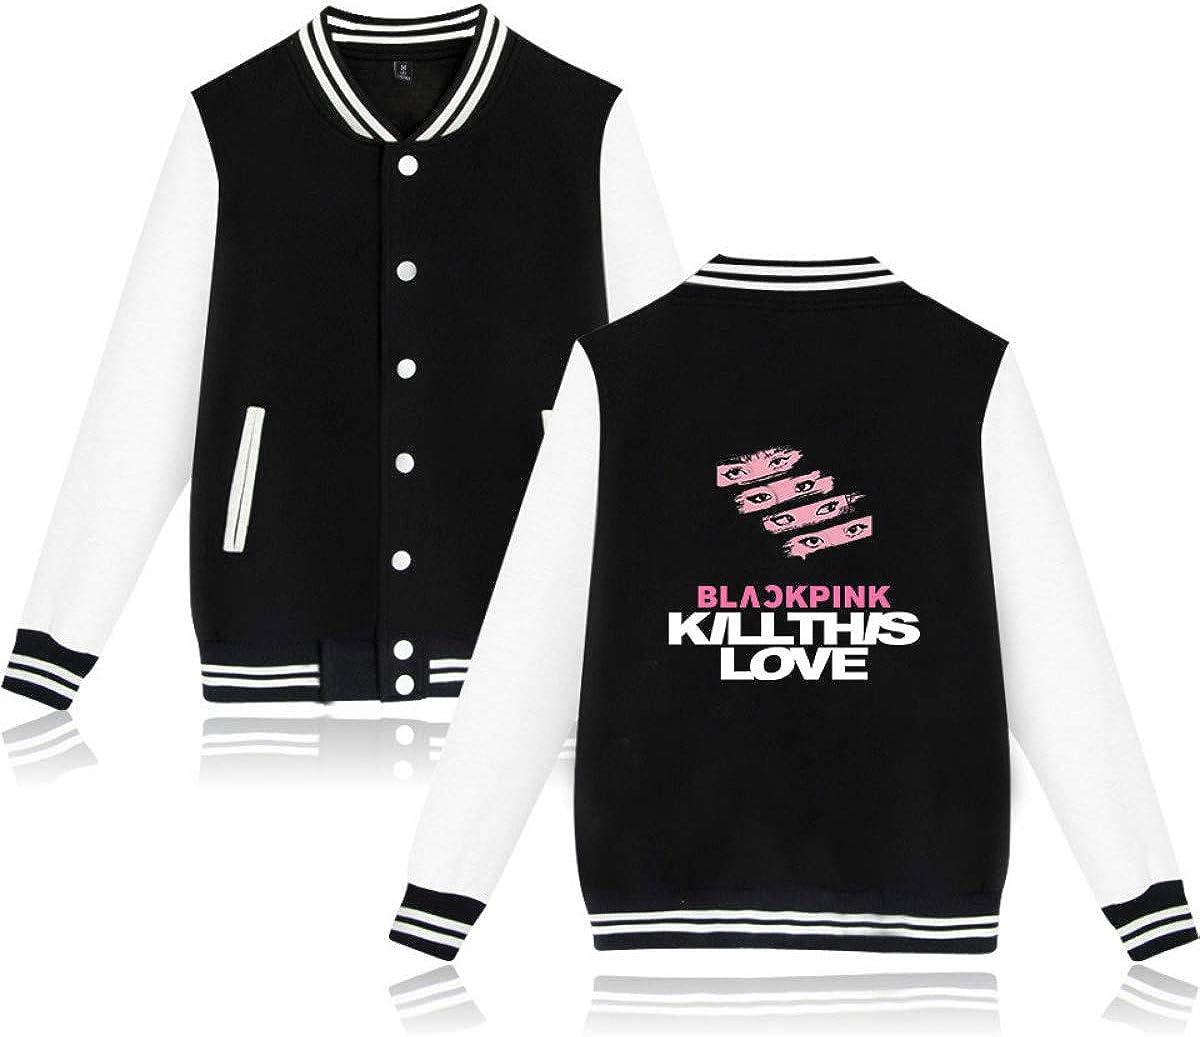 Forever Younger Kpop Blackpink Bedruckte Baseballmäntel Jacken Mäntel Outwear Langarm Hoodie Sweatshirt Lisa Rose Jennie JISOO 1